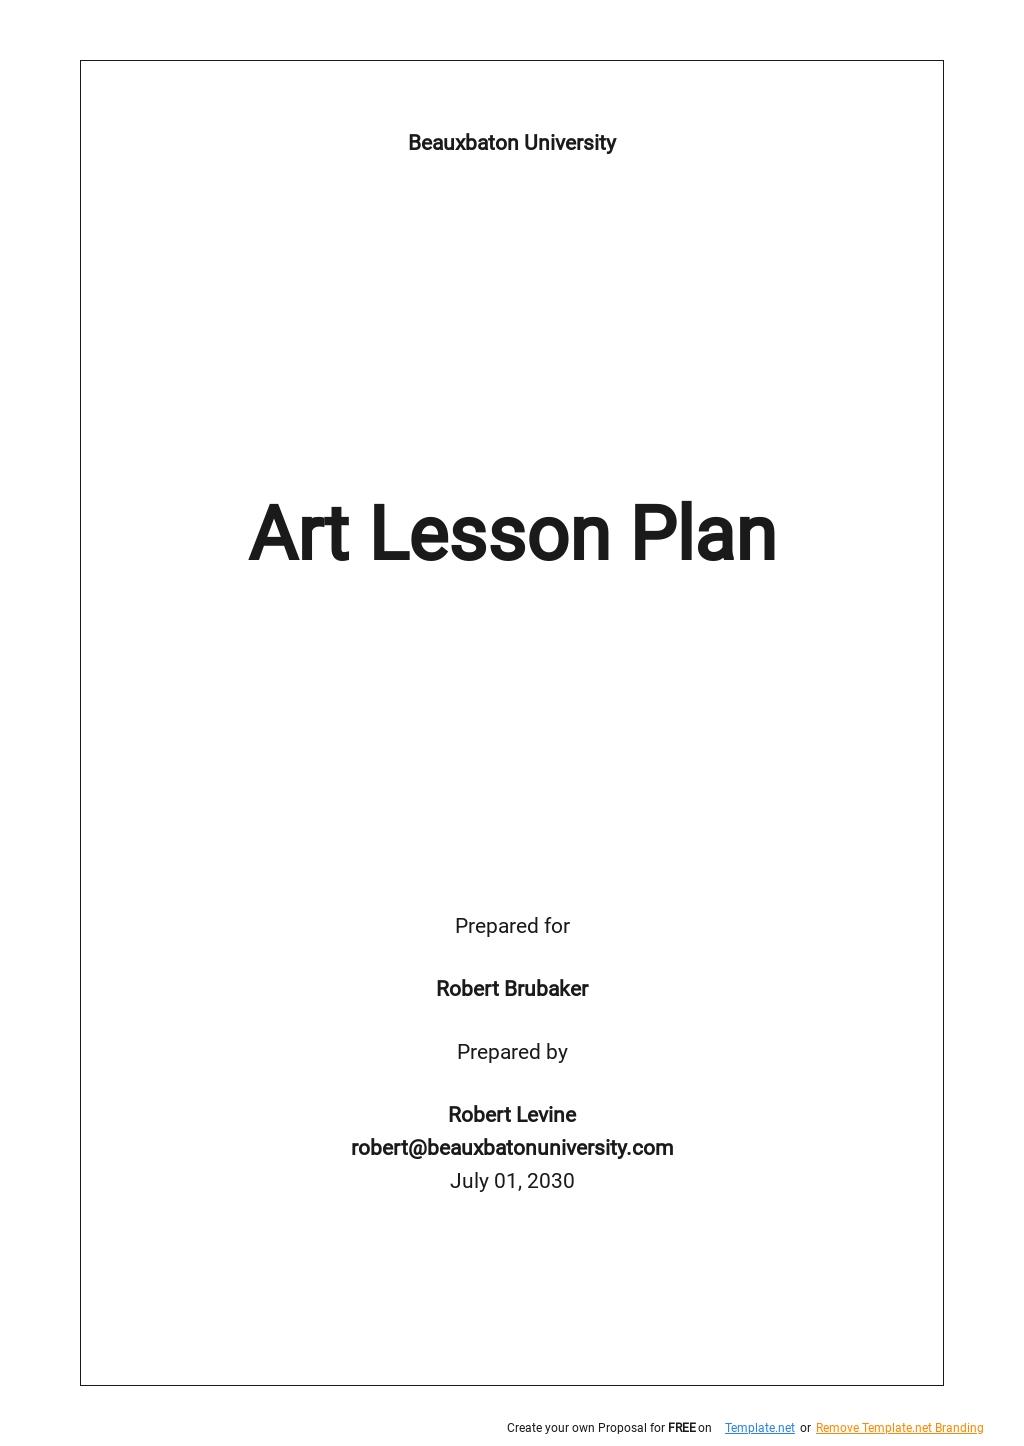 Art Lesson Plan Template.jpe